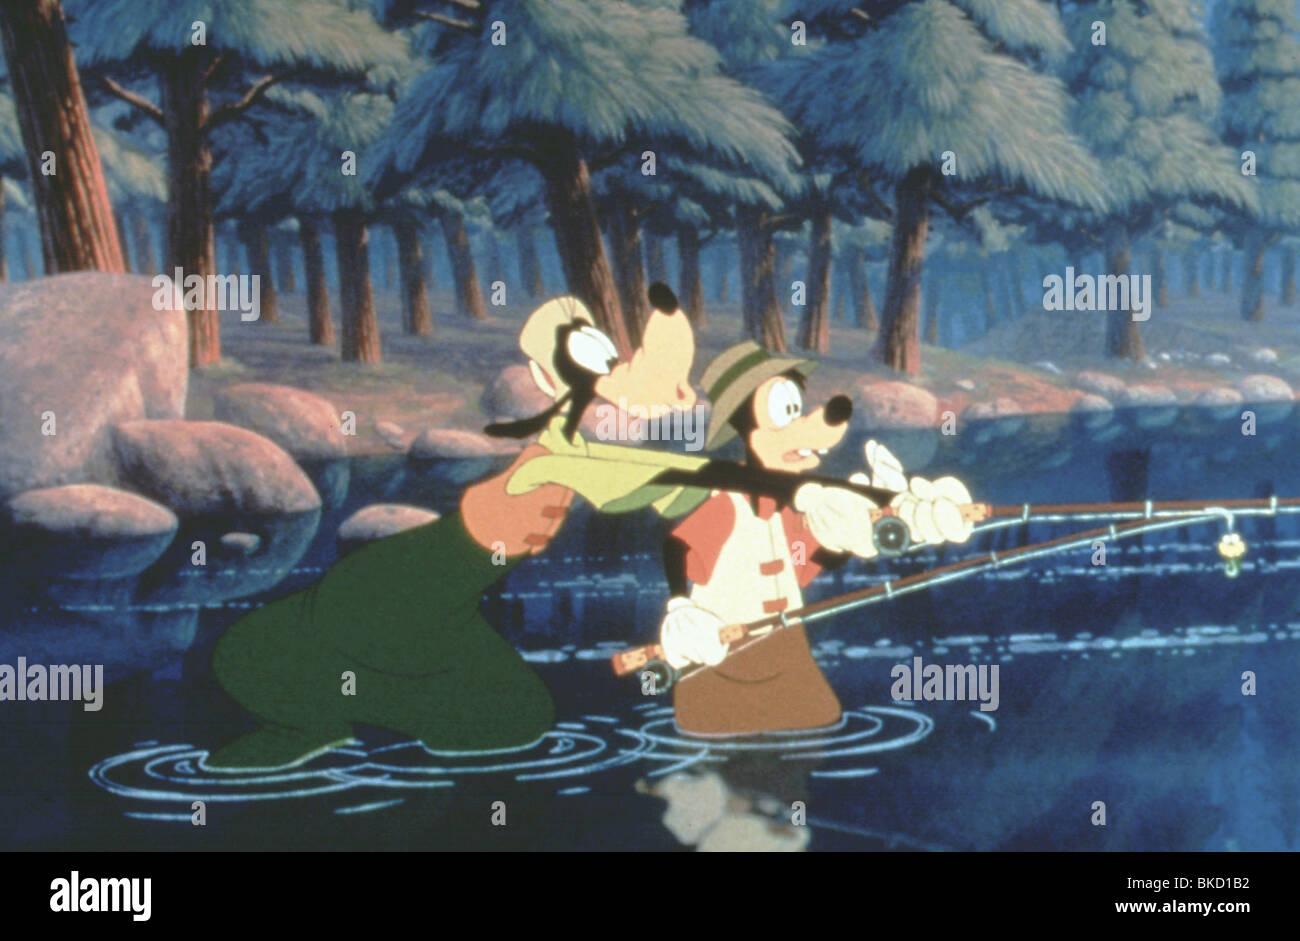 A GOOFY MOVIE (1996) ANIMATED CREDIT DISNEY GOOF 009 - Stock Image